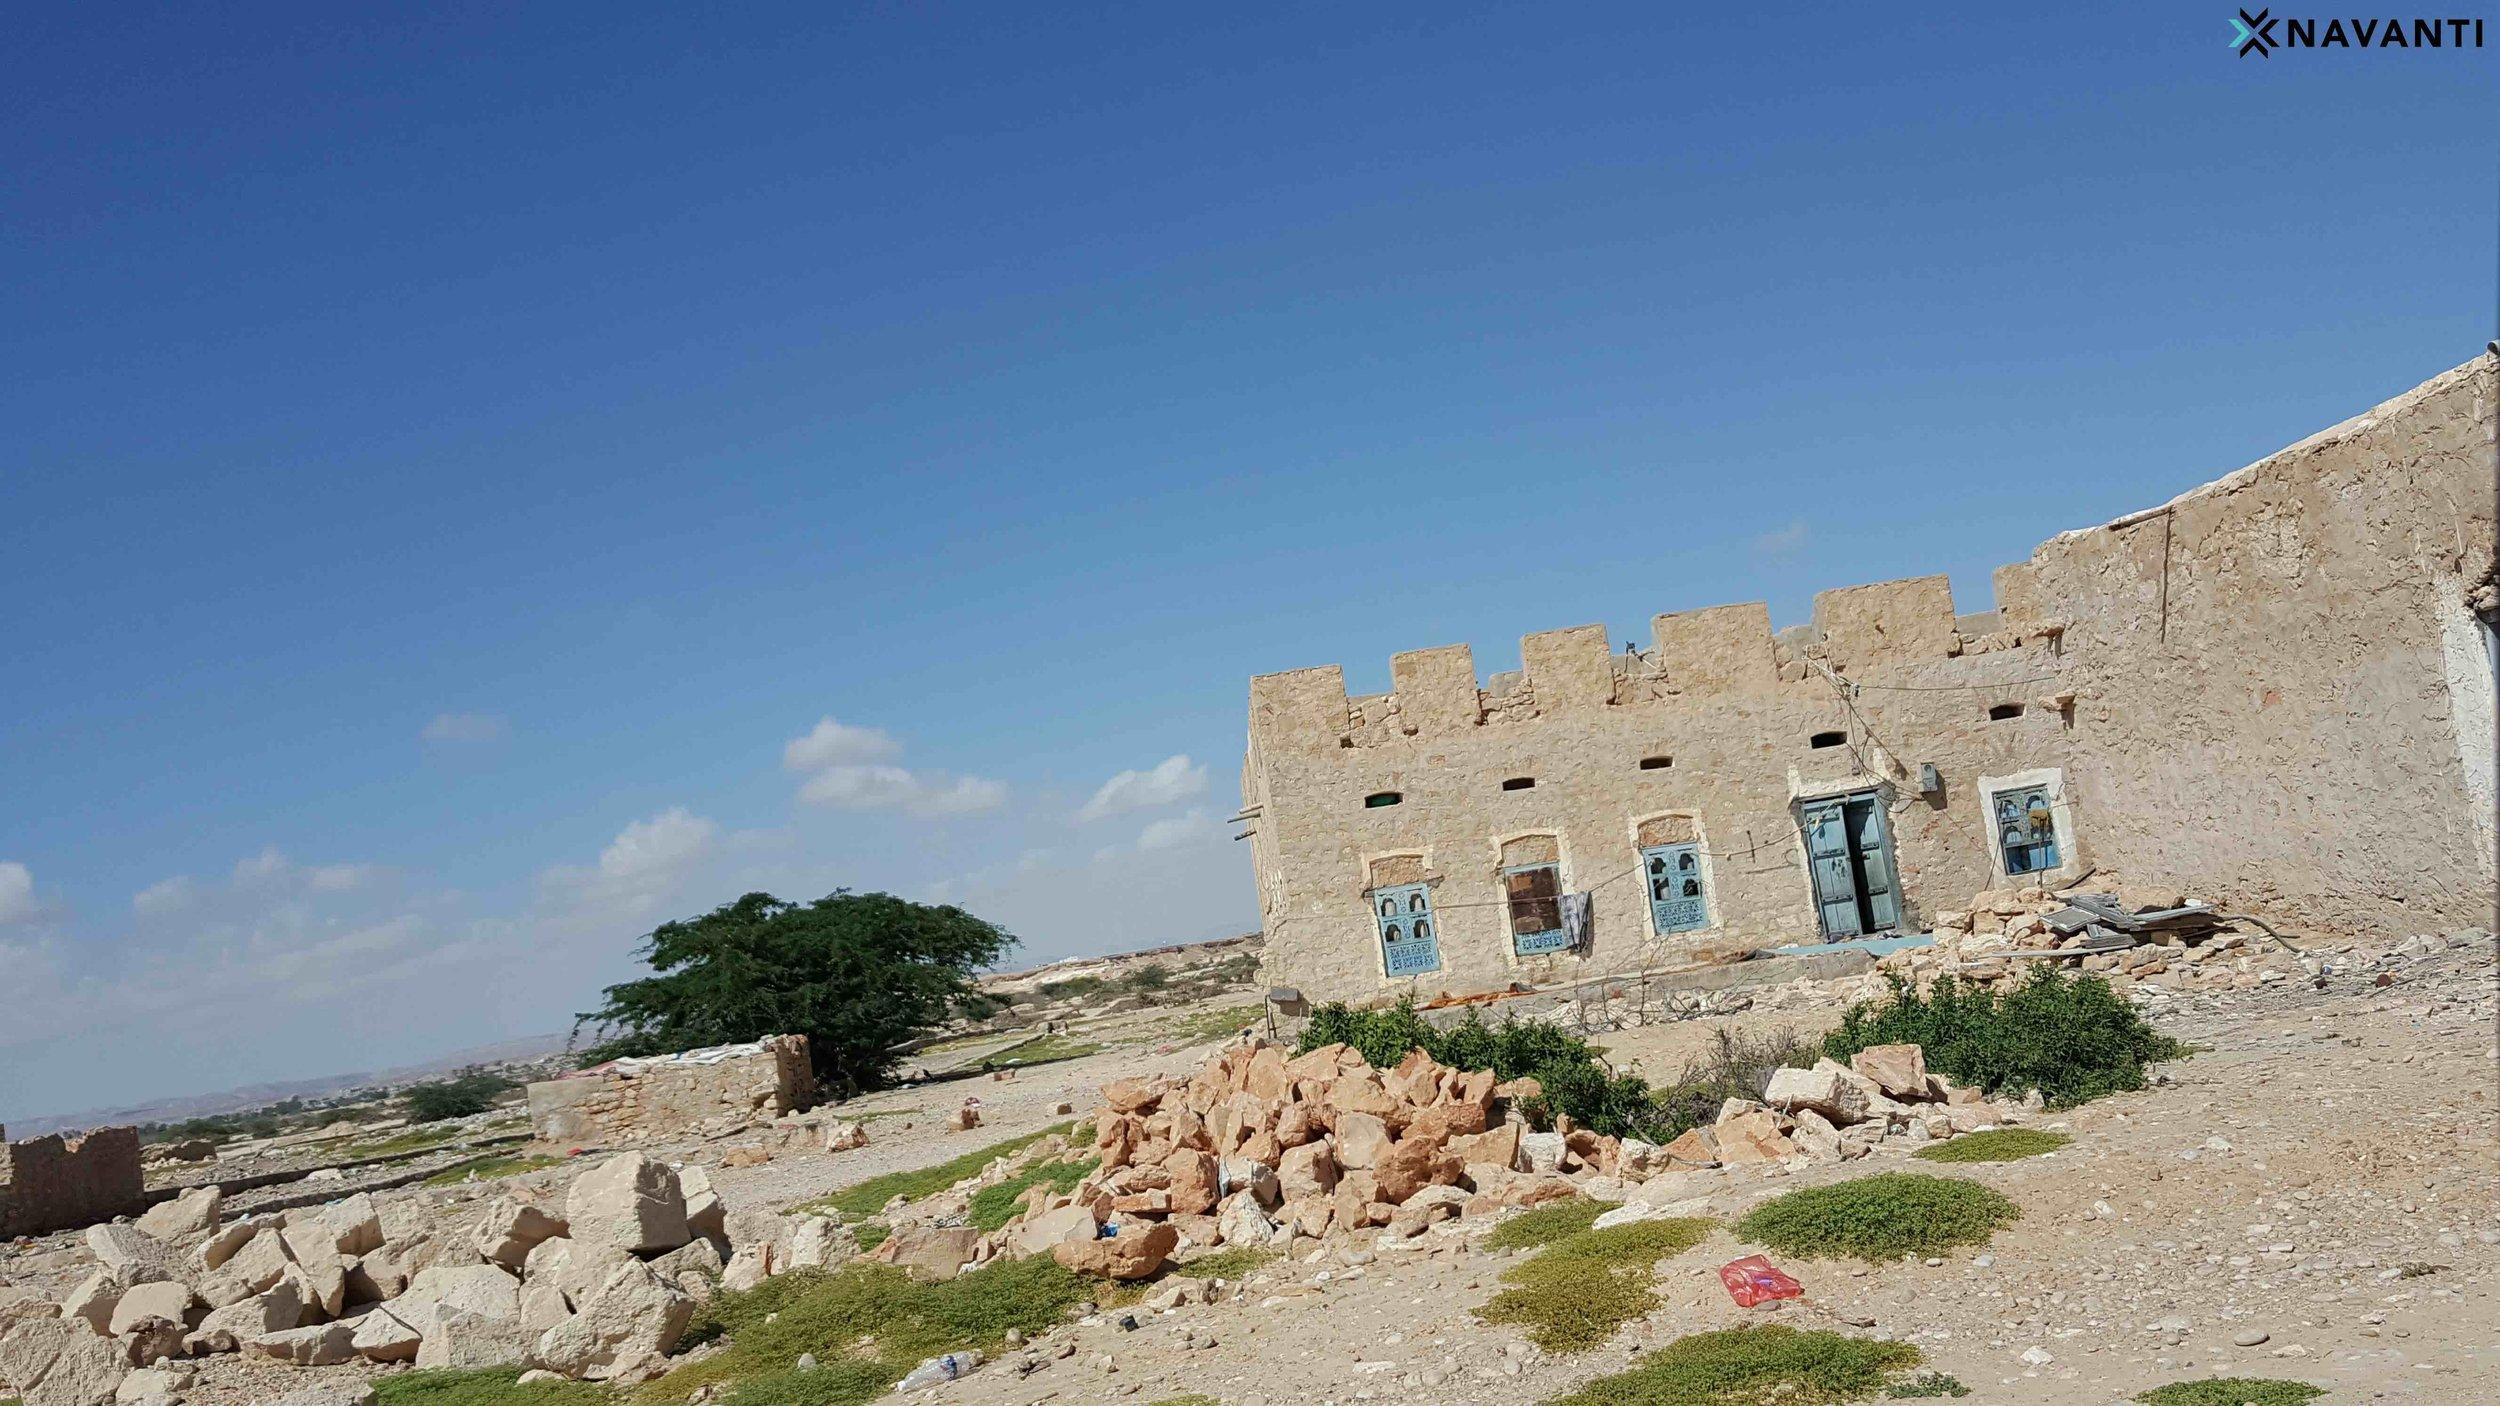 Working class homes in al-Ghayda, al-Mahra. Source: Navanti